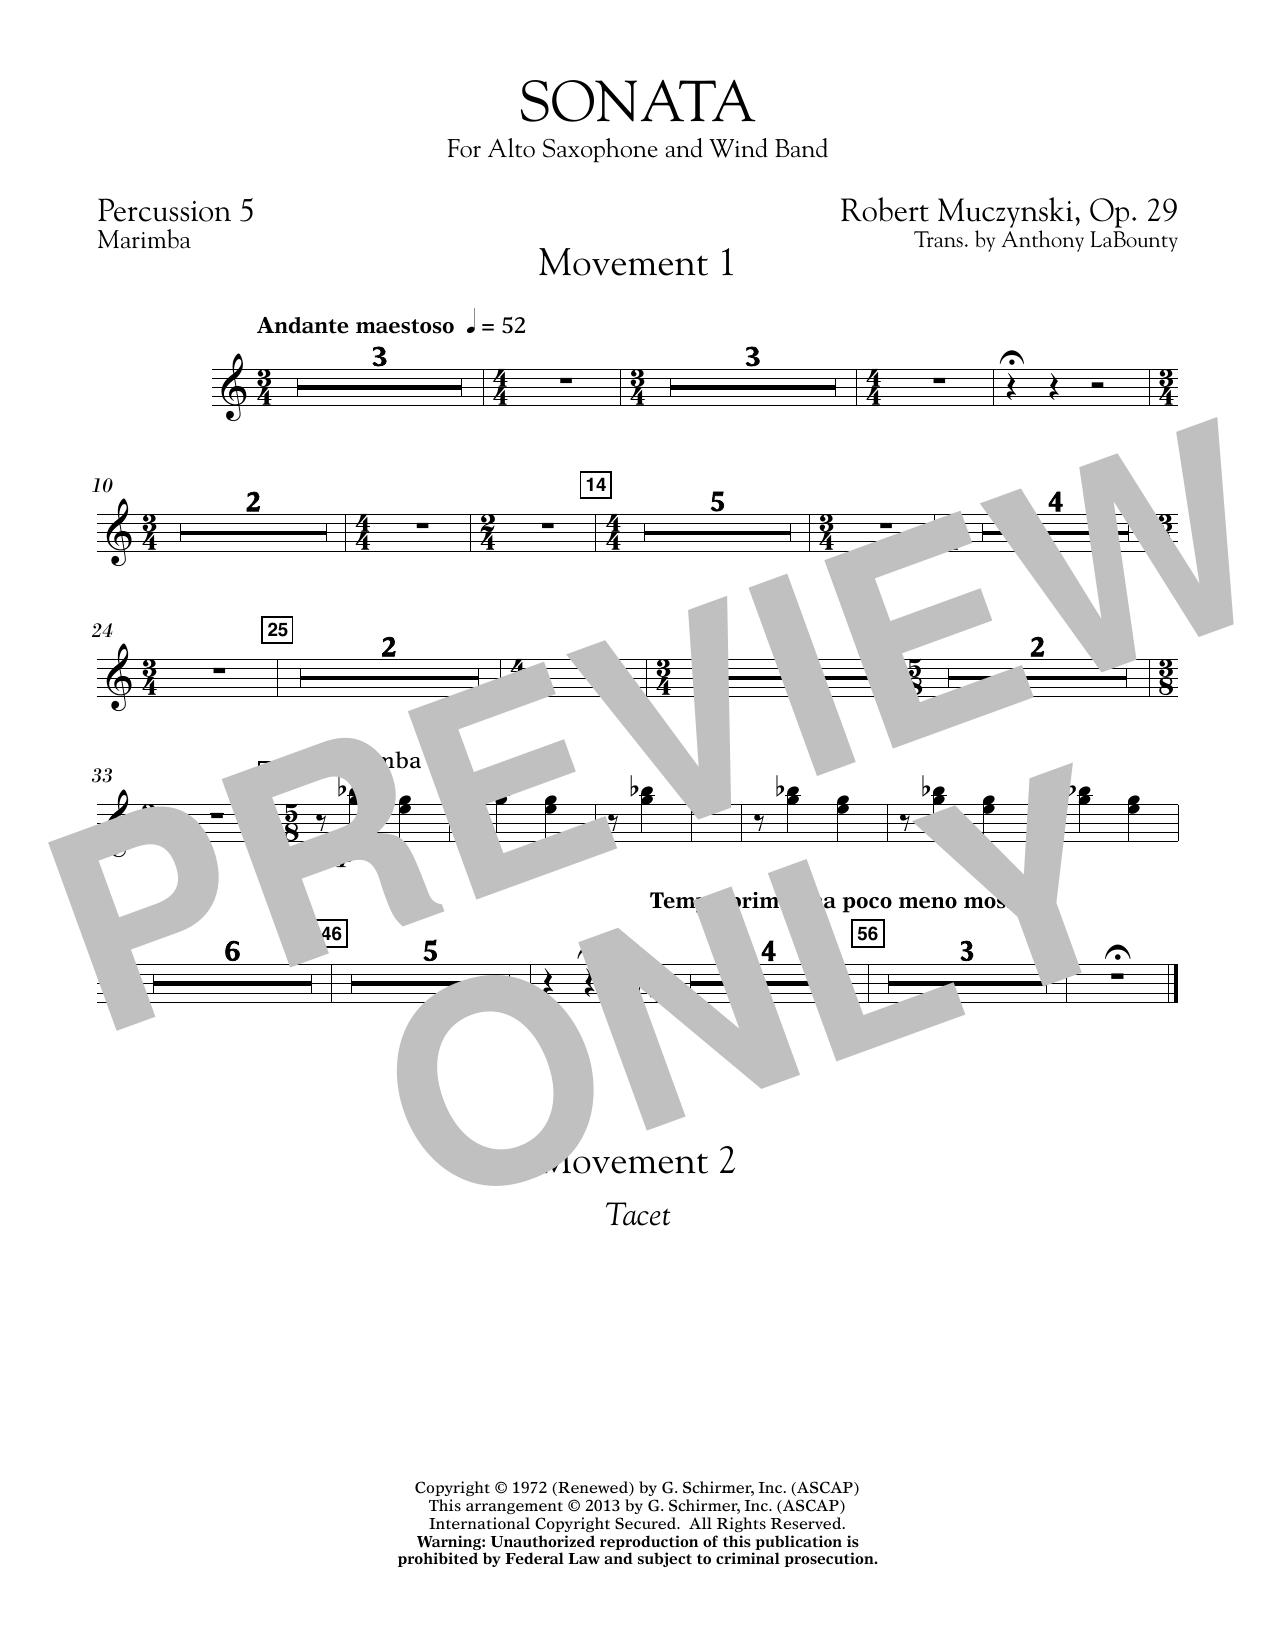 Sonata for Alto Saxophone, Op. 29 - Percussion 5 (Concert Band)